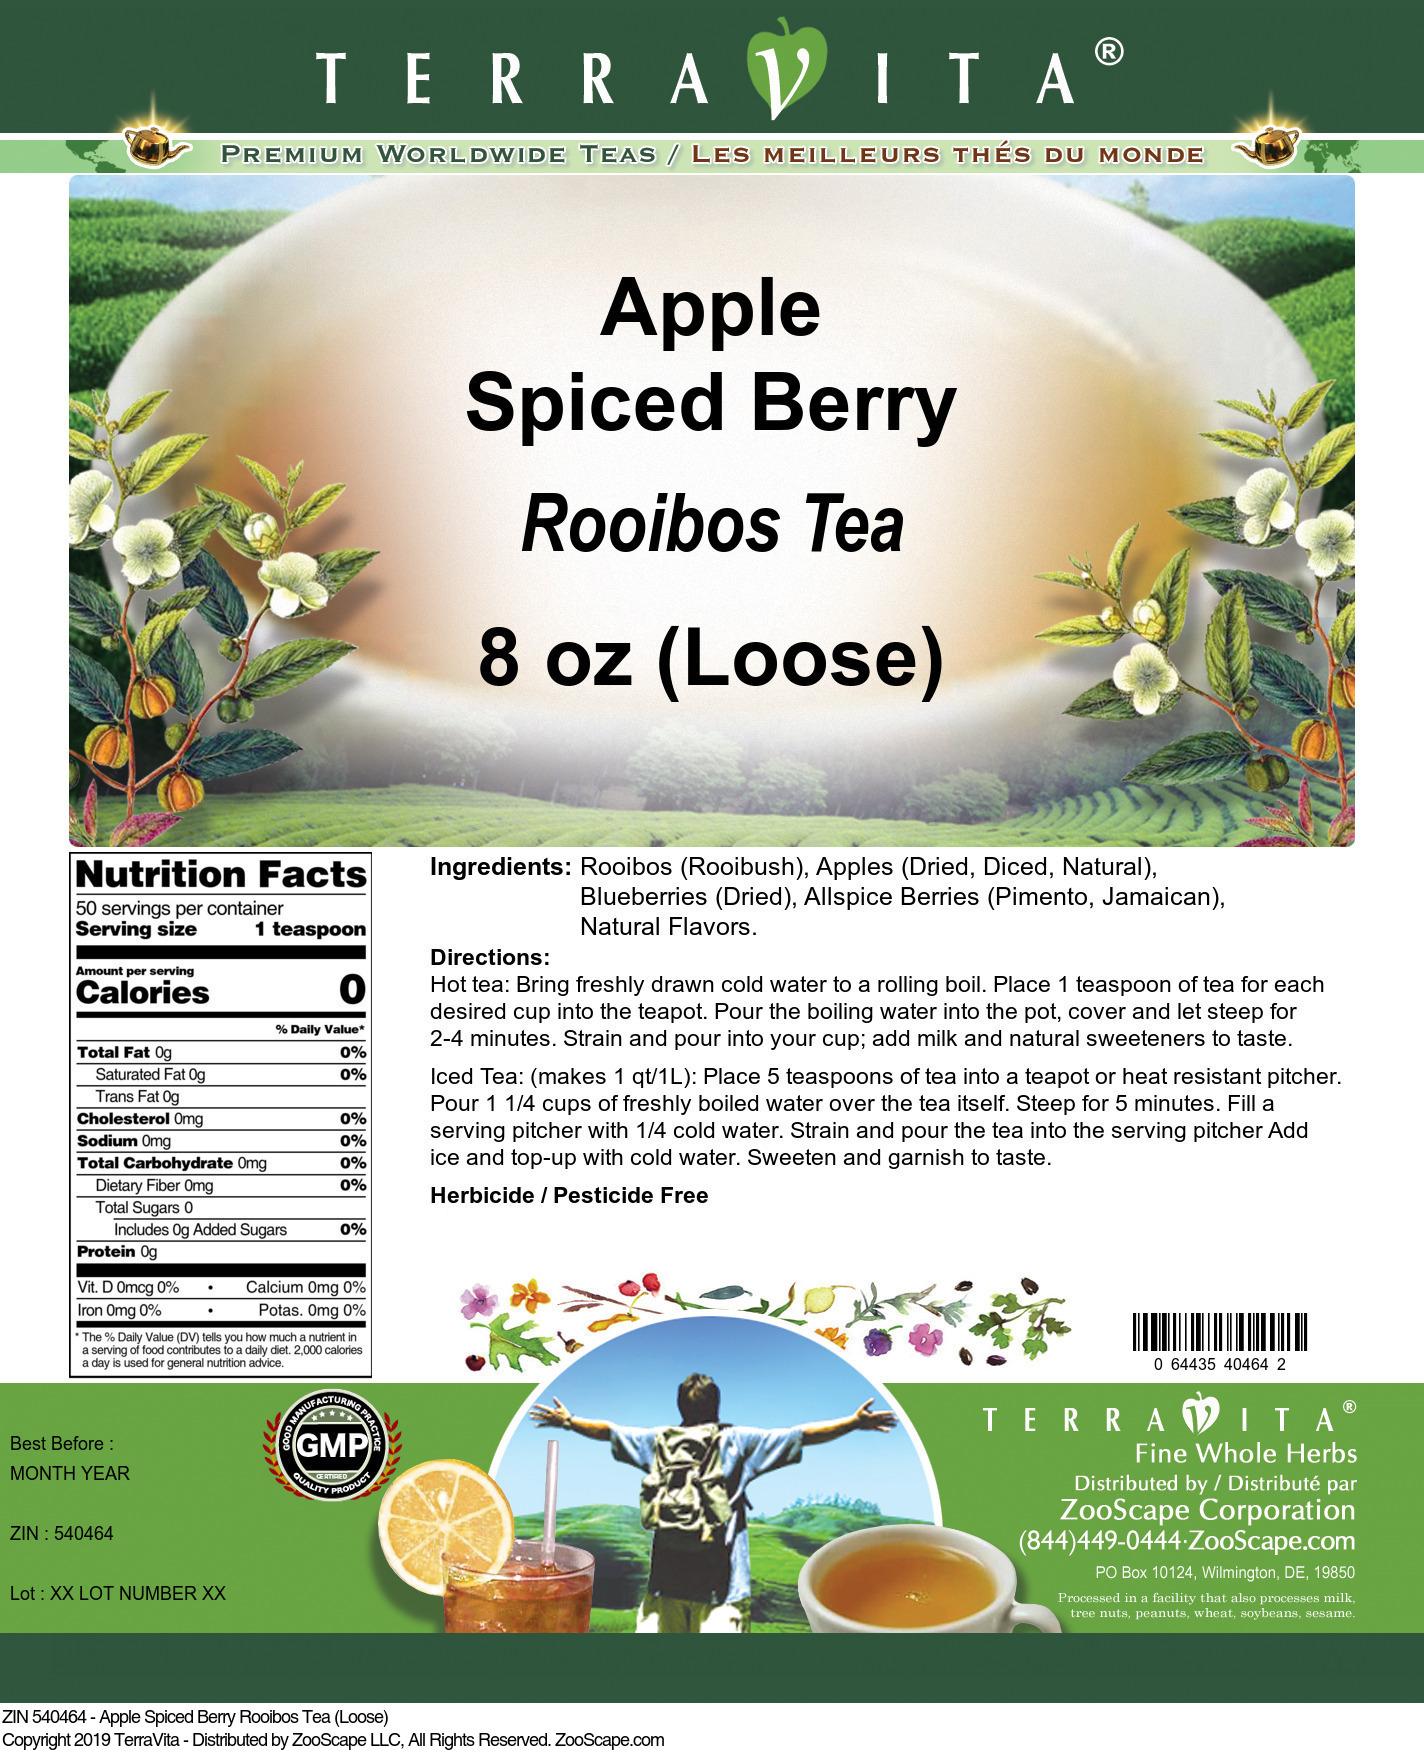 Apple Spiced Berry Rooibos Tea